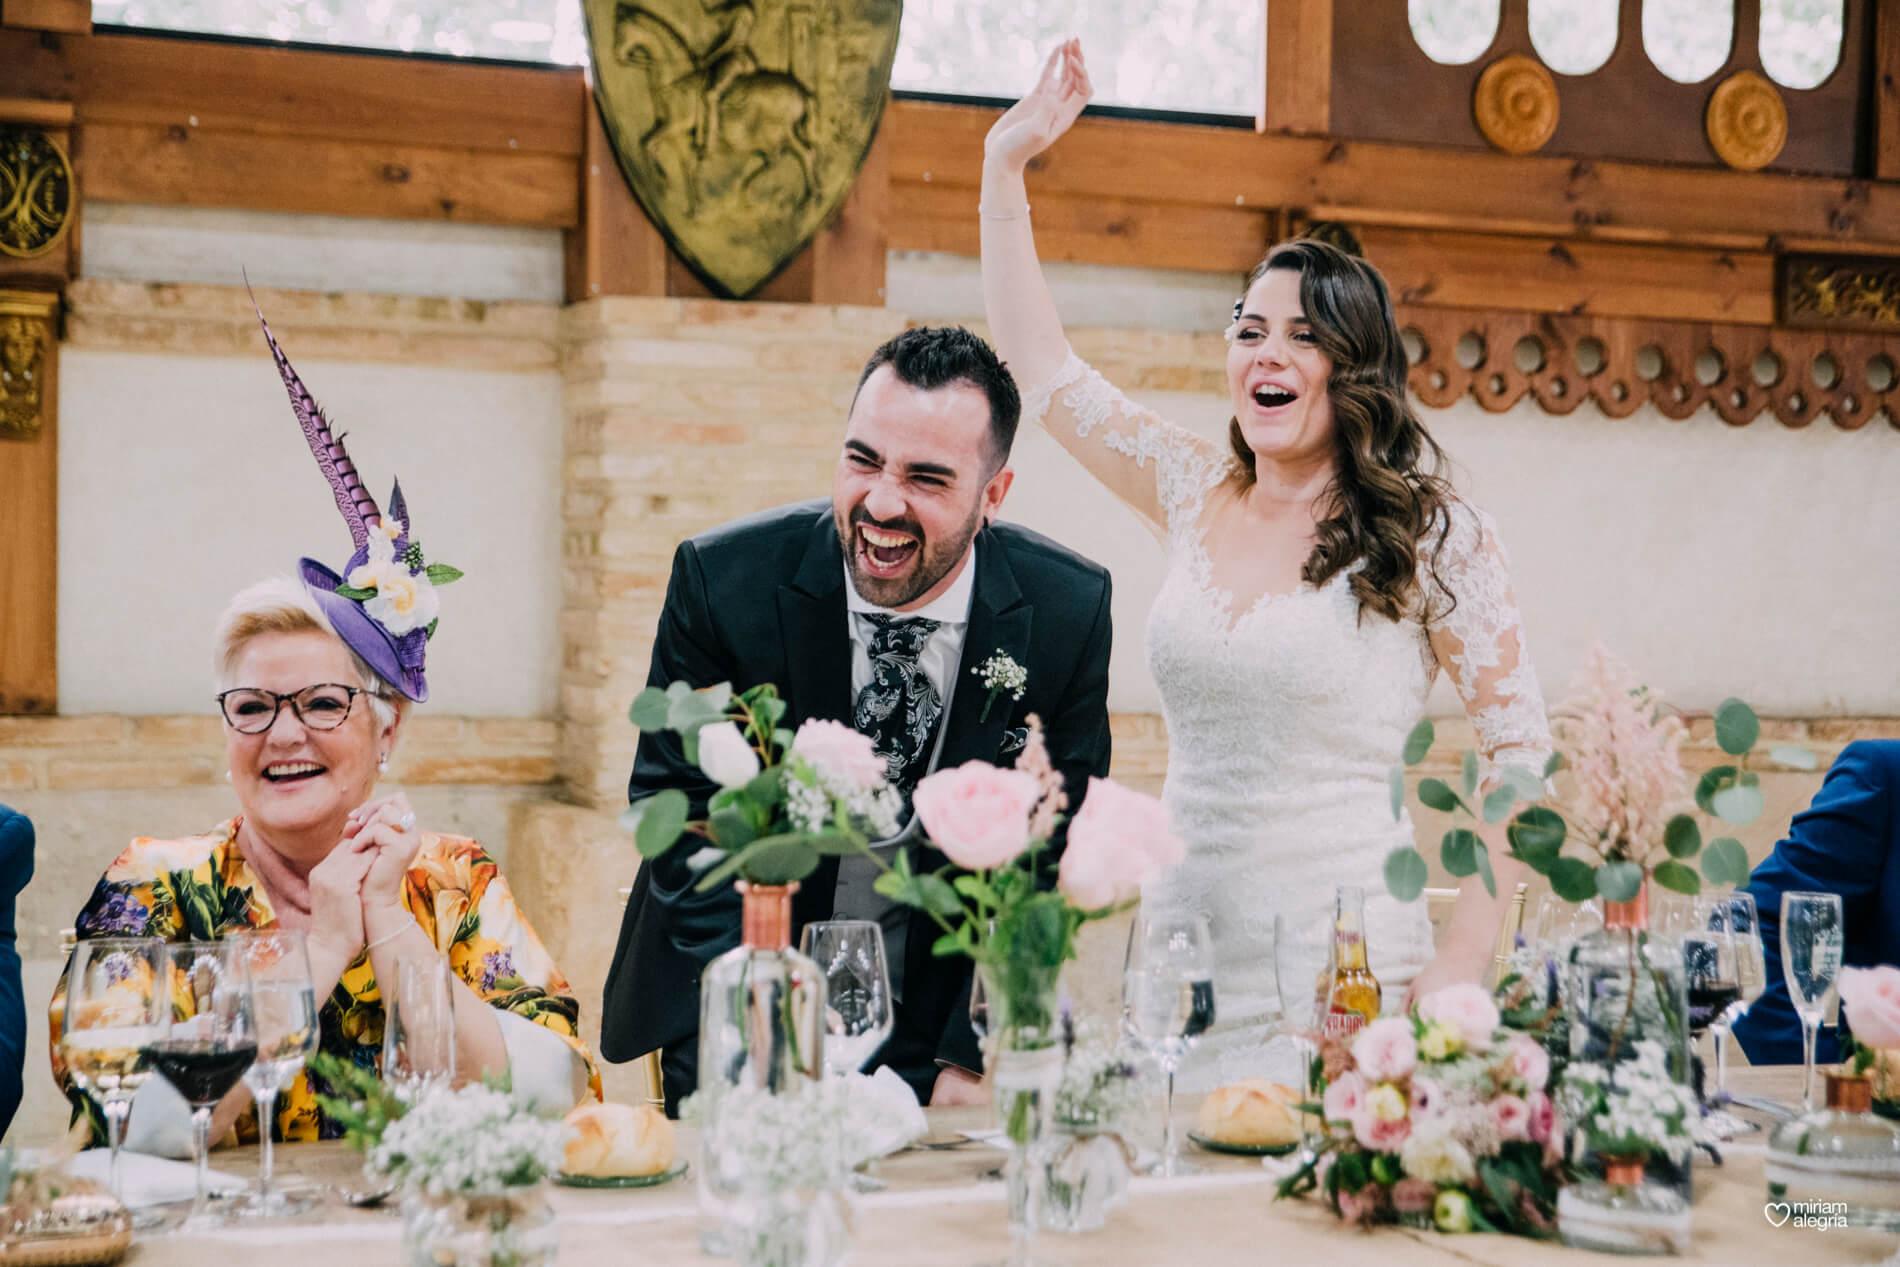 boda-en-finca-jurosa-miriam-alegria-111